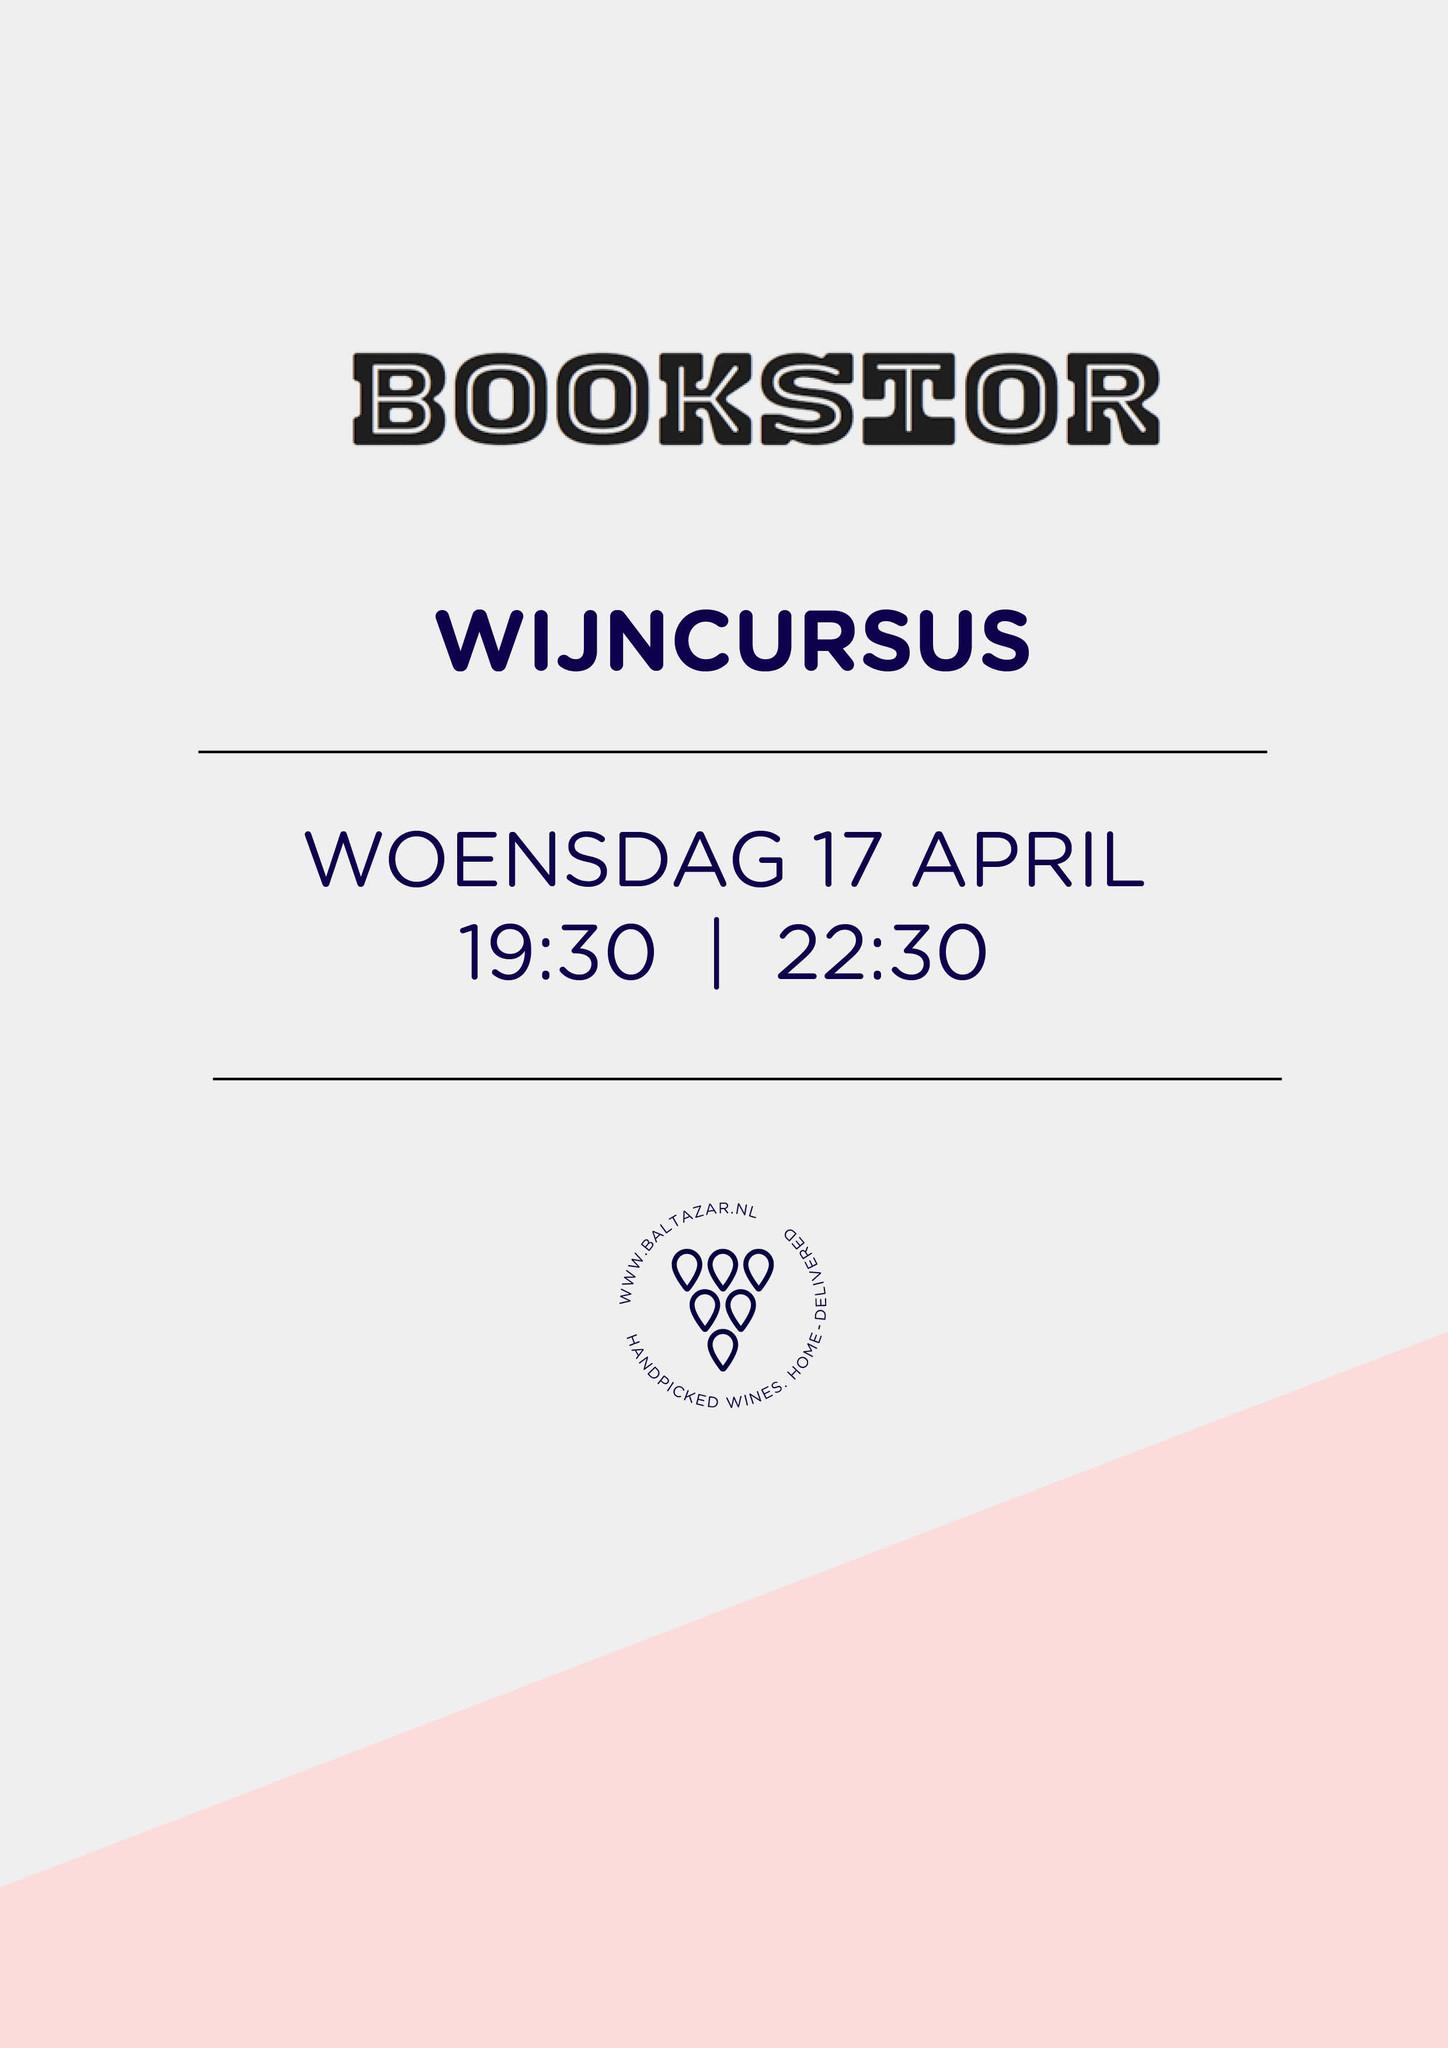 Wijncursus 17 april  Bookstor Den Haag